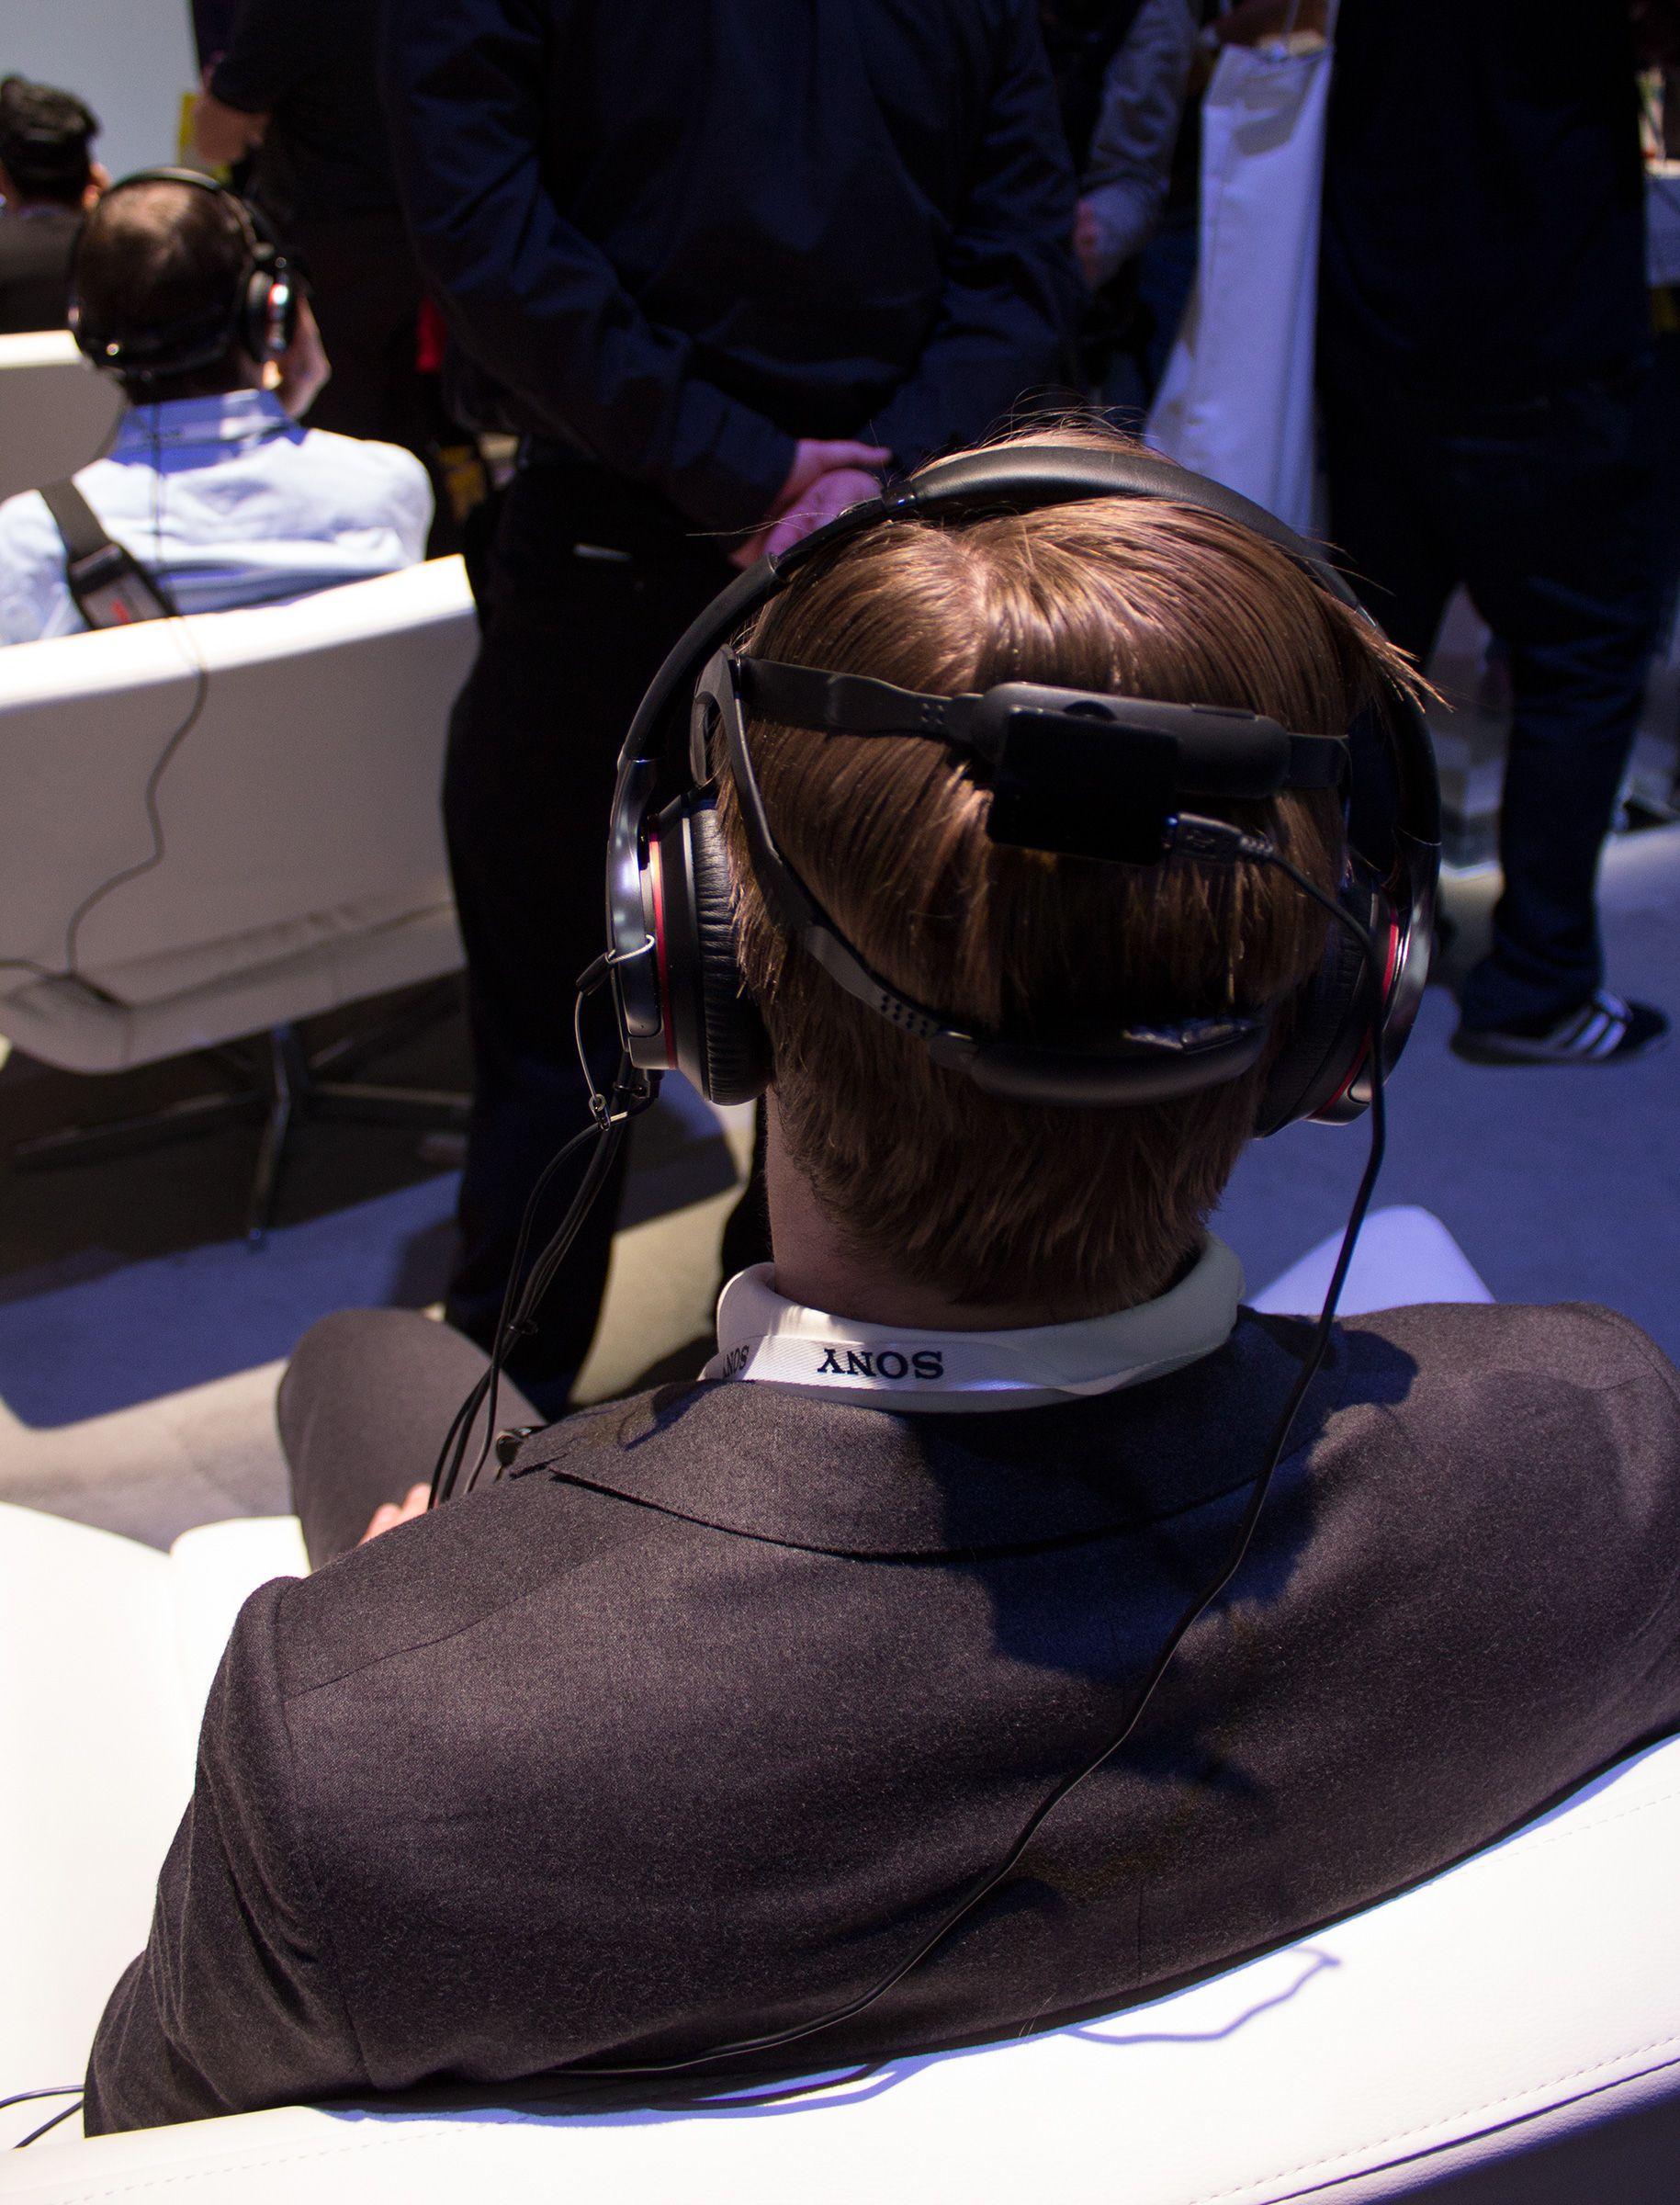 Brillene sitter lett og komfortabelt på hodet.Foto: Hardware.no